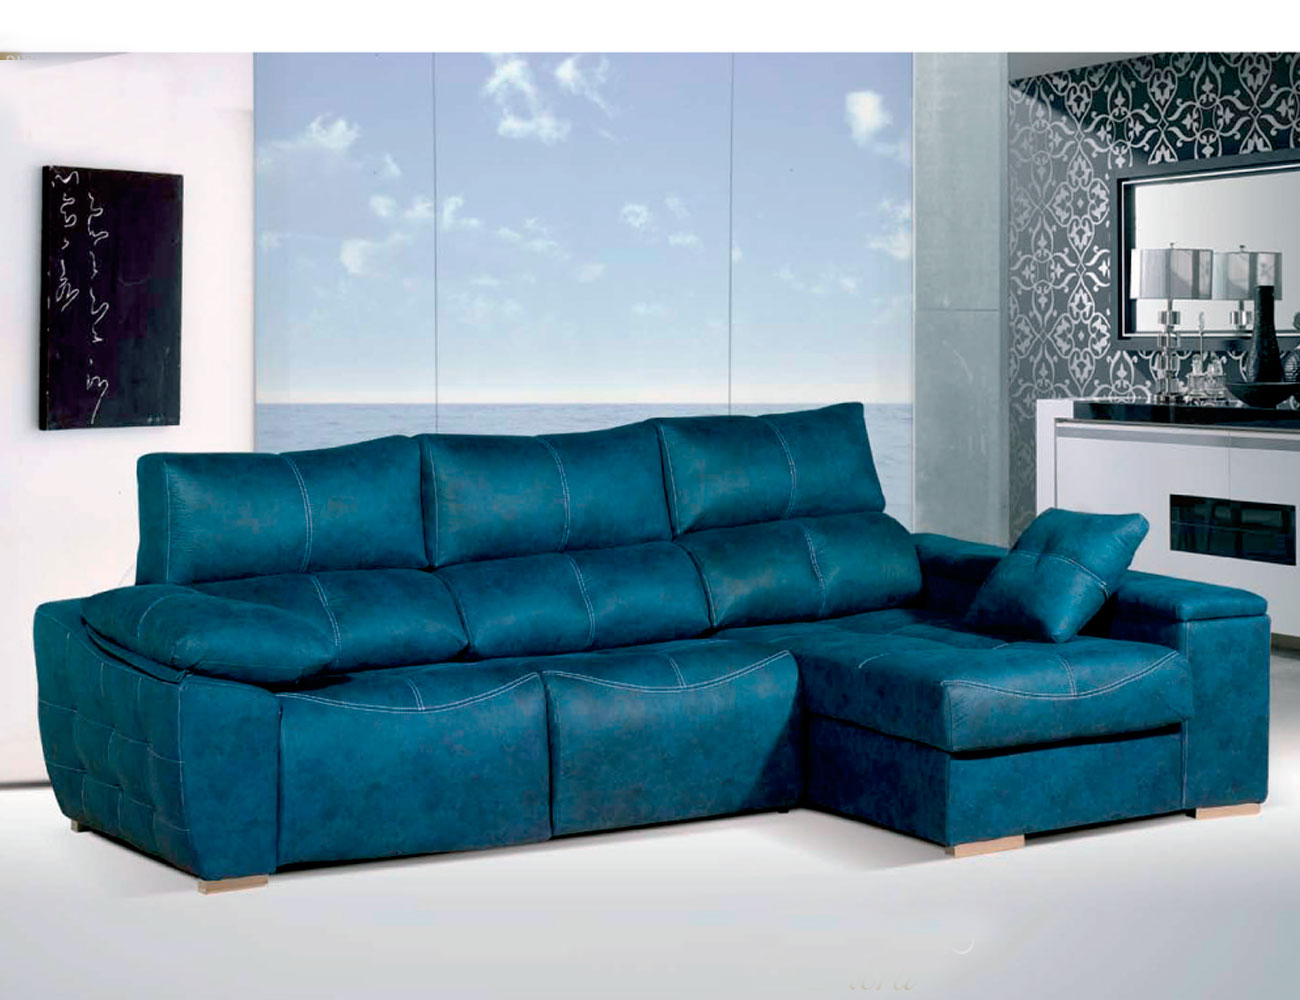 Sofa chaiselongue relax 2 motores anti manchas turquesa17